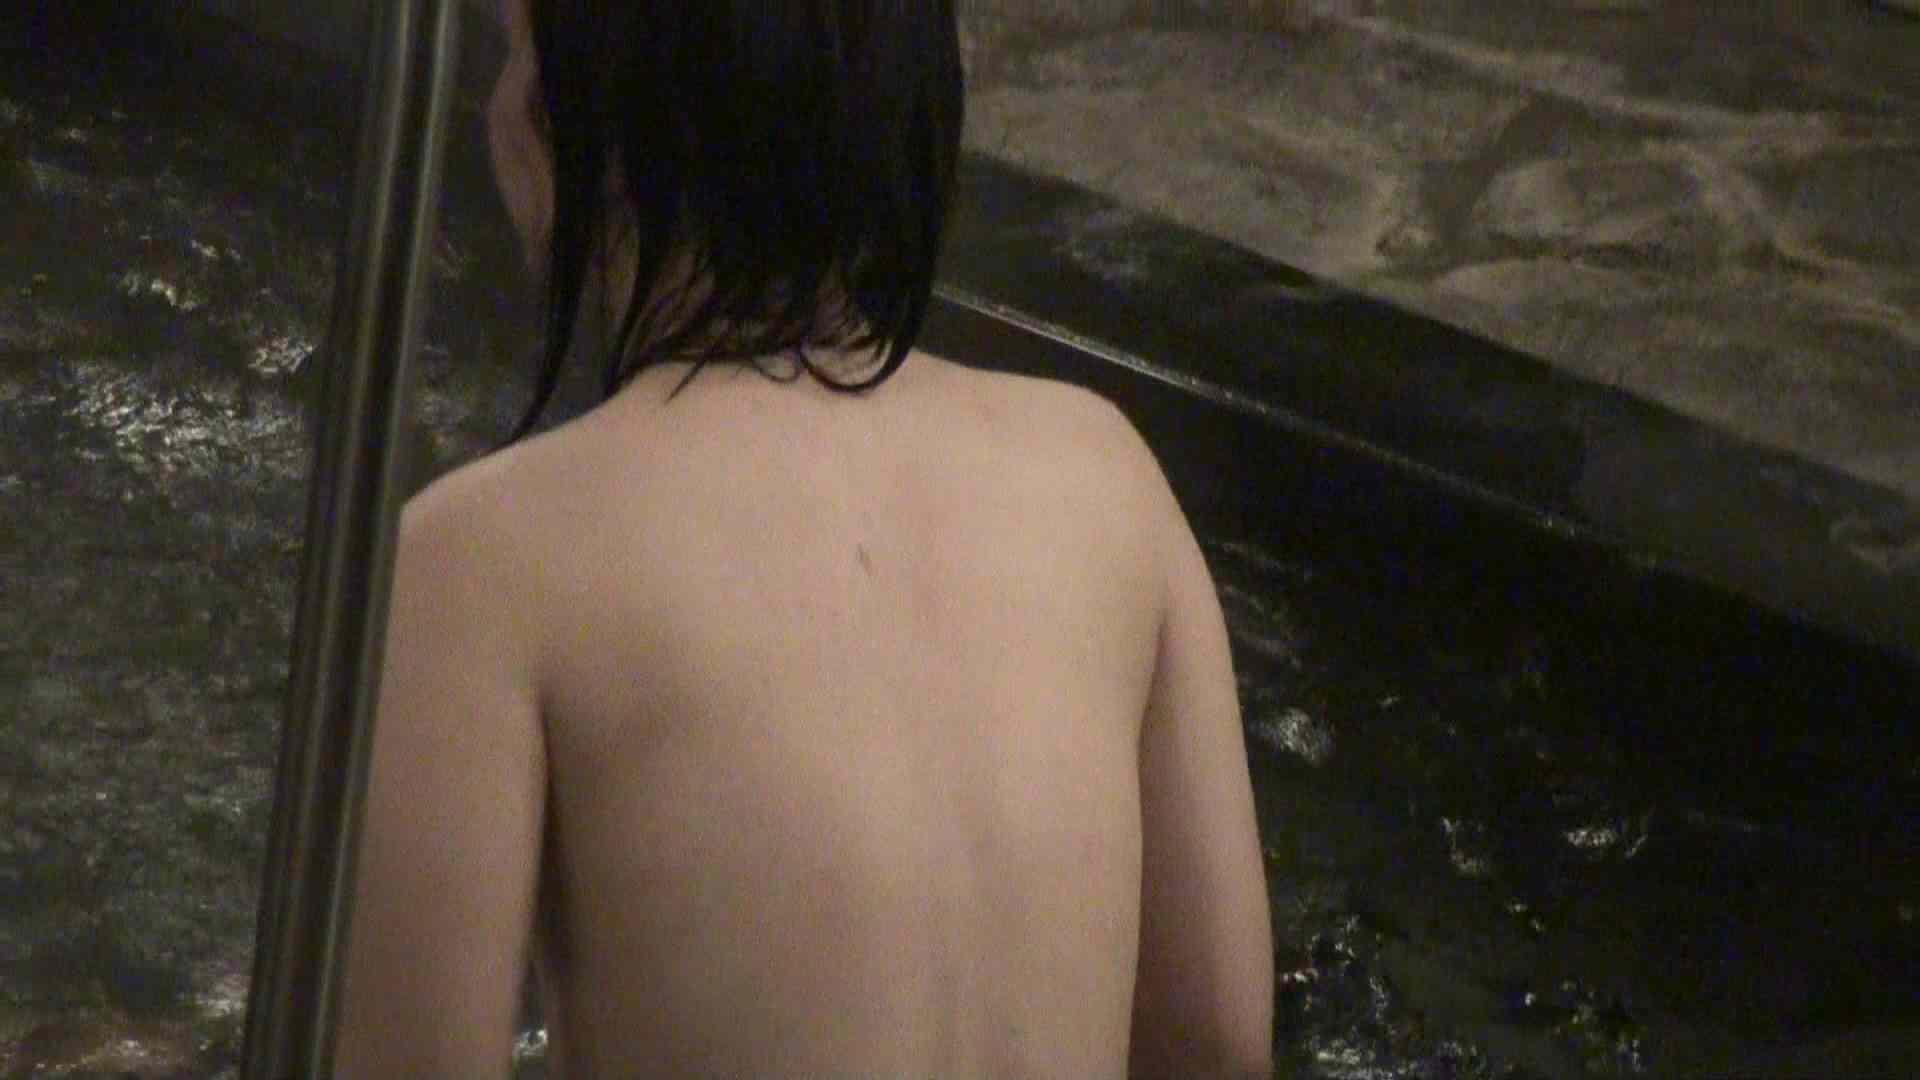 Aquaな露天風呂Vol.404 エッチな盗撮 盗み撮り動画 112pic 42